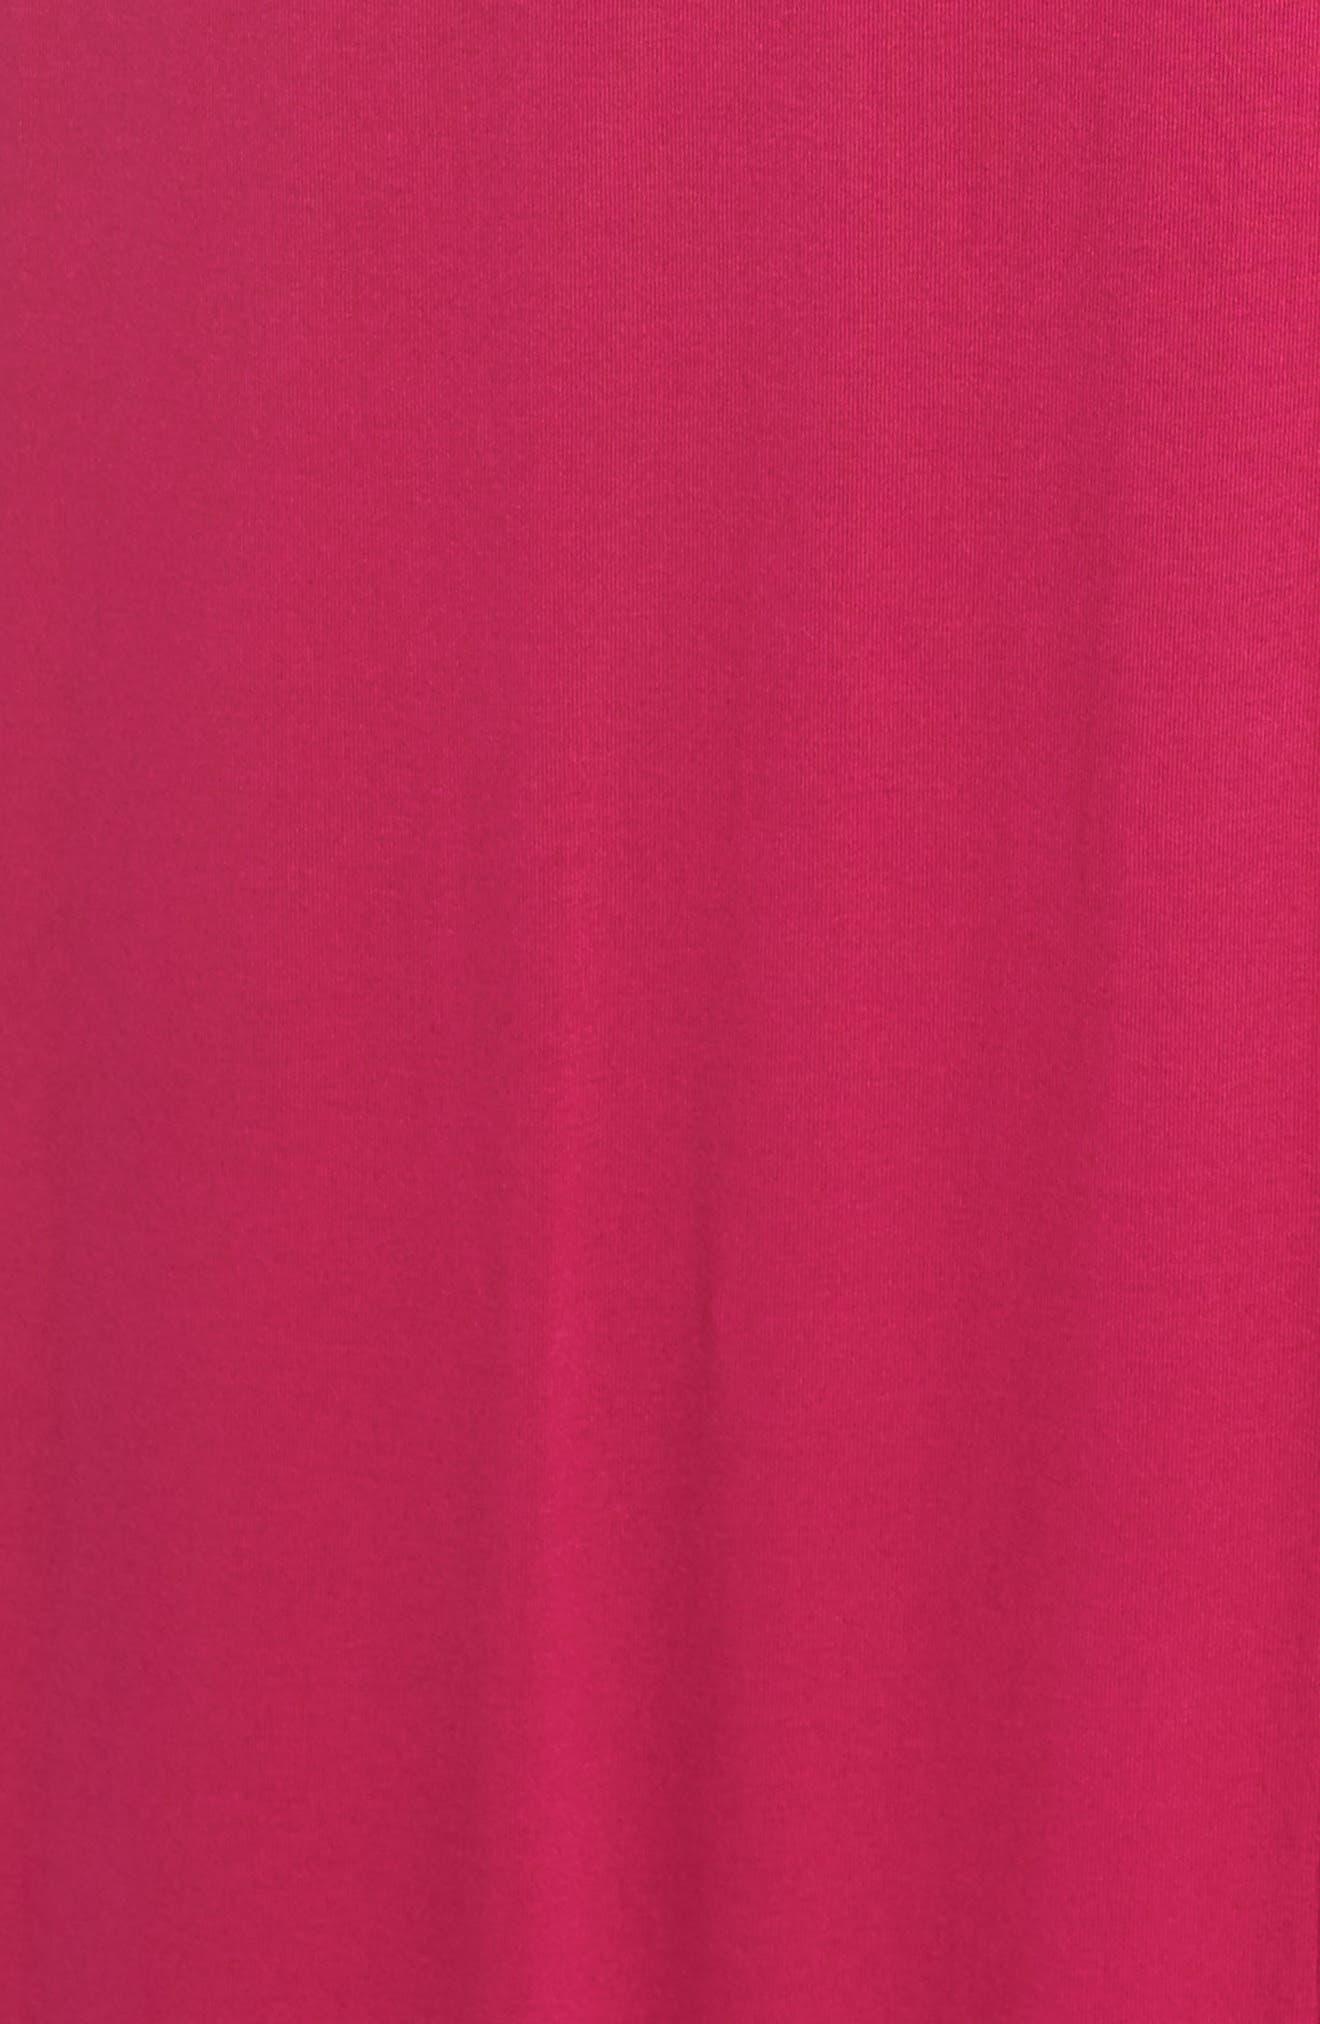 Jersey Maxi Dress,                             Alternate thumbnail 6, color,                             Pink